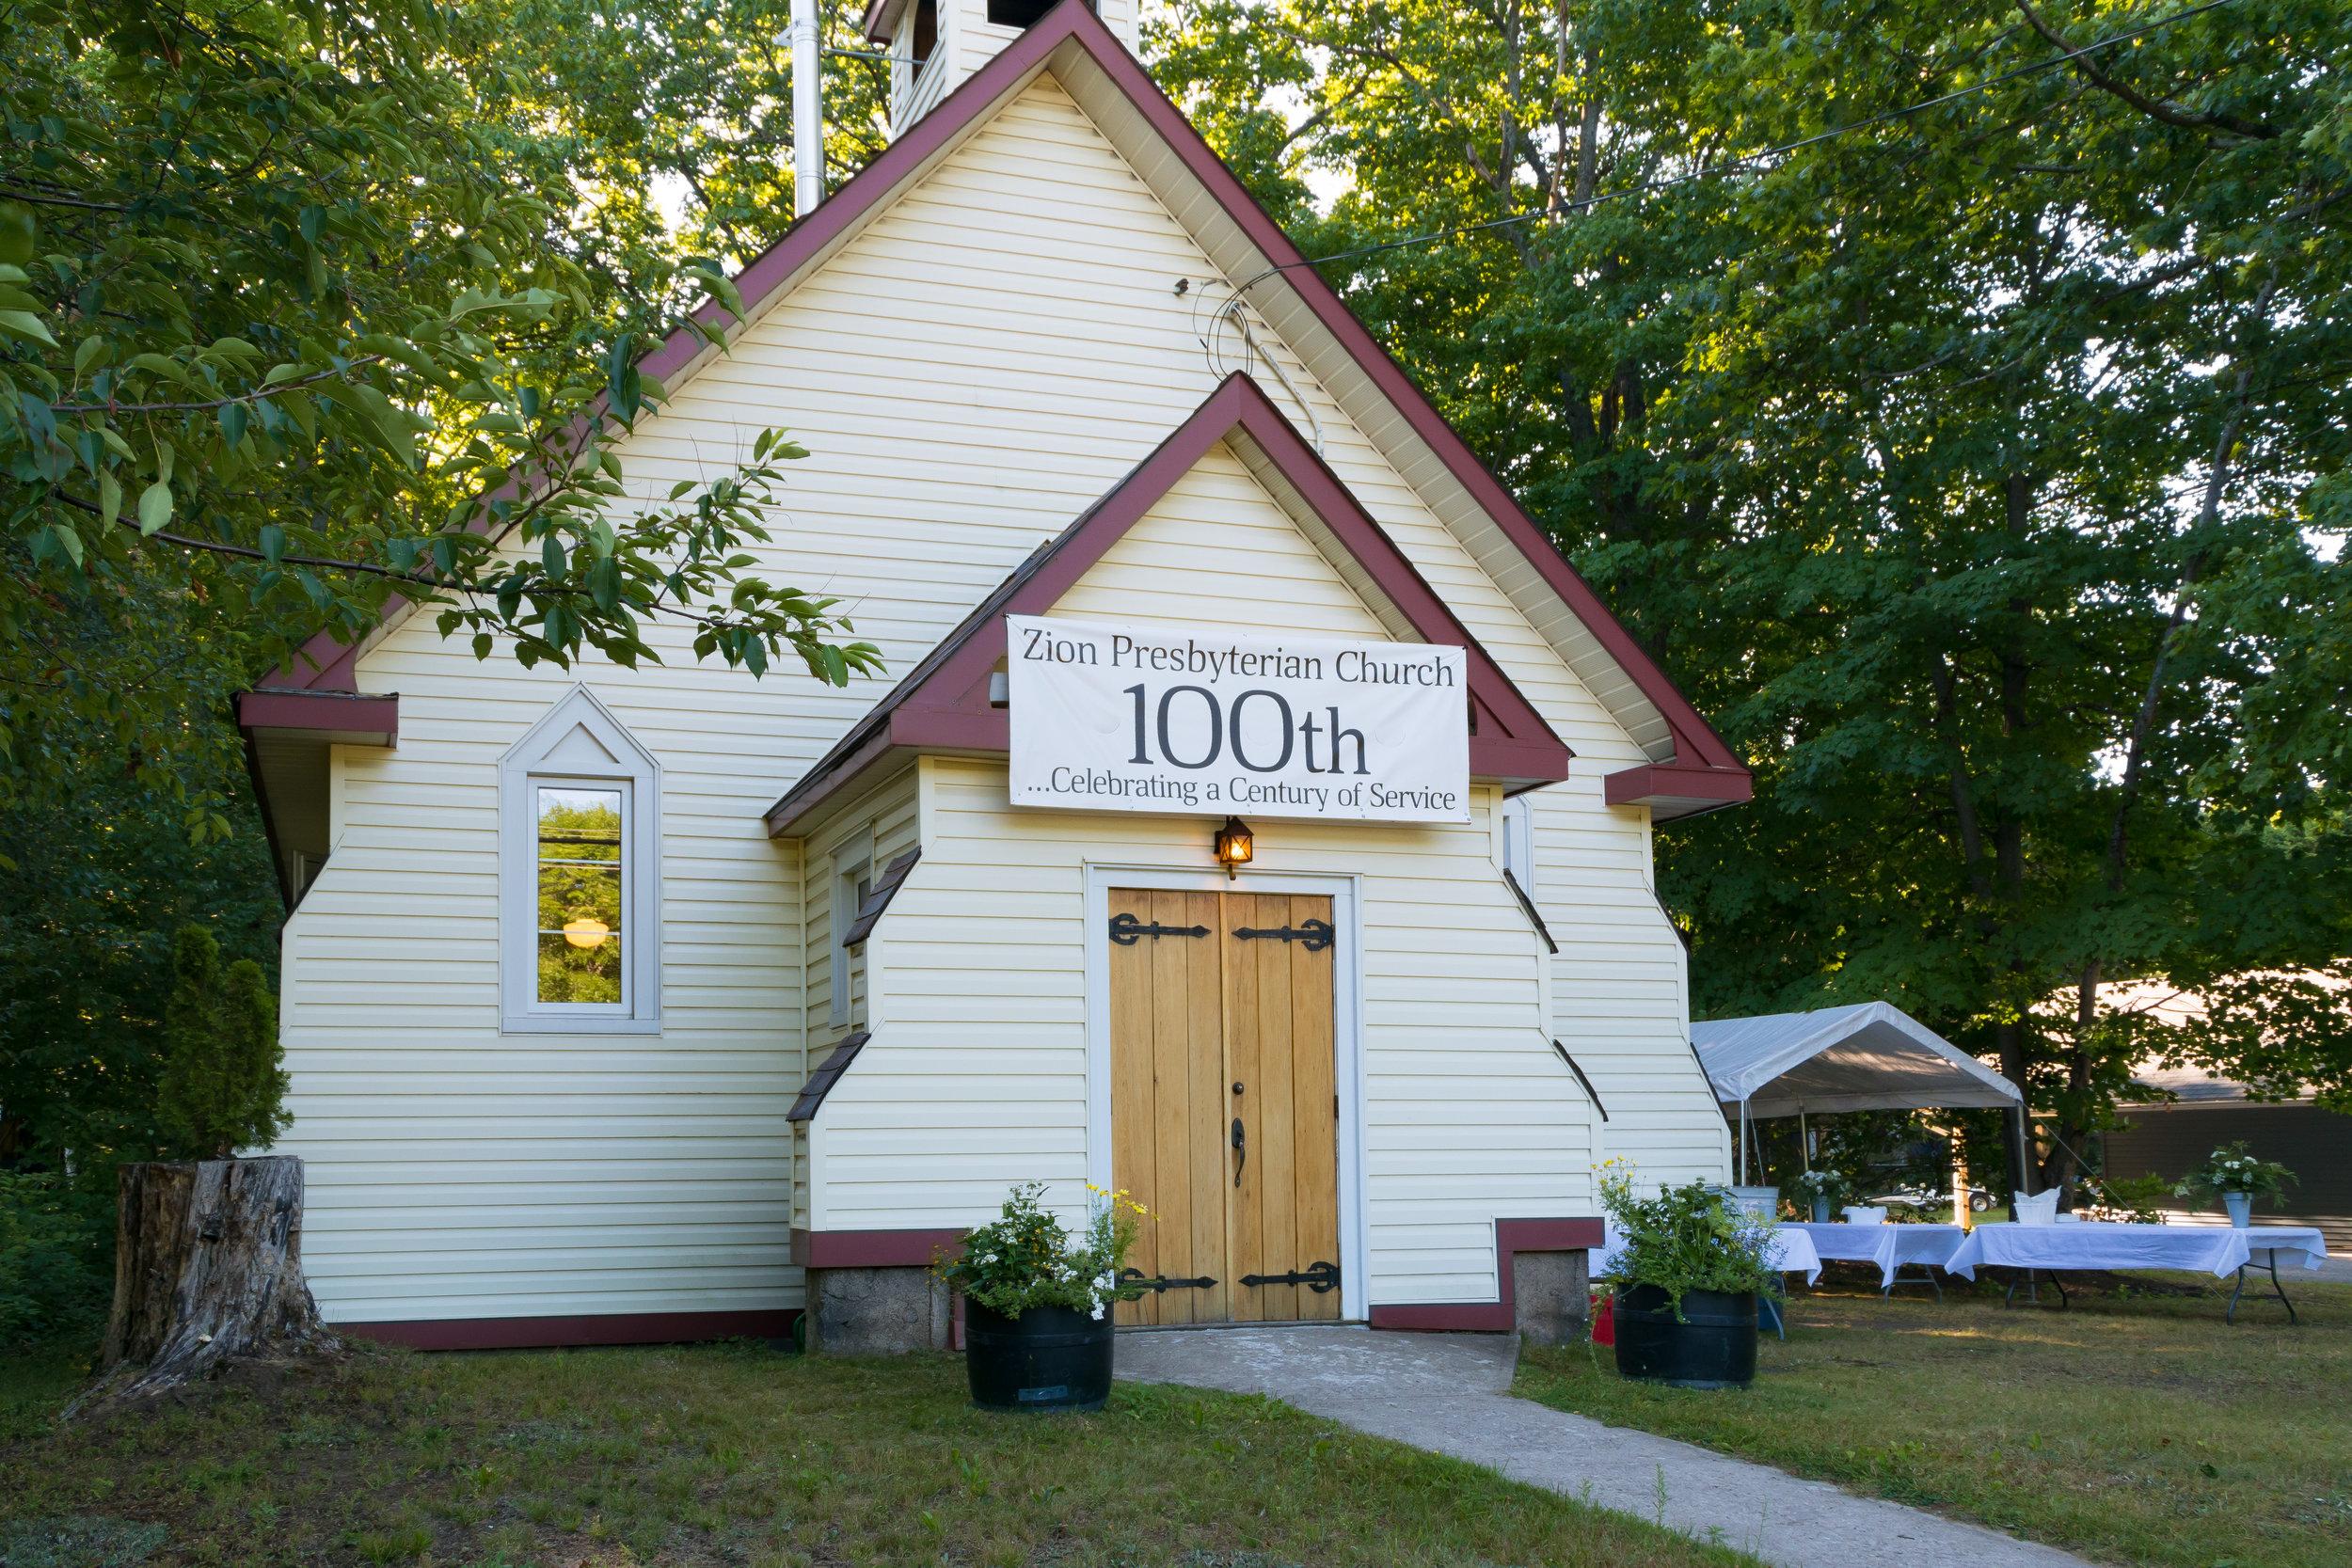 Zion Presbyterian in Torrance